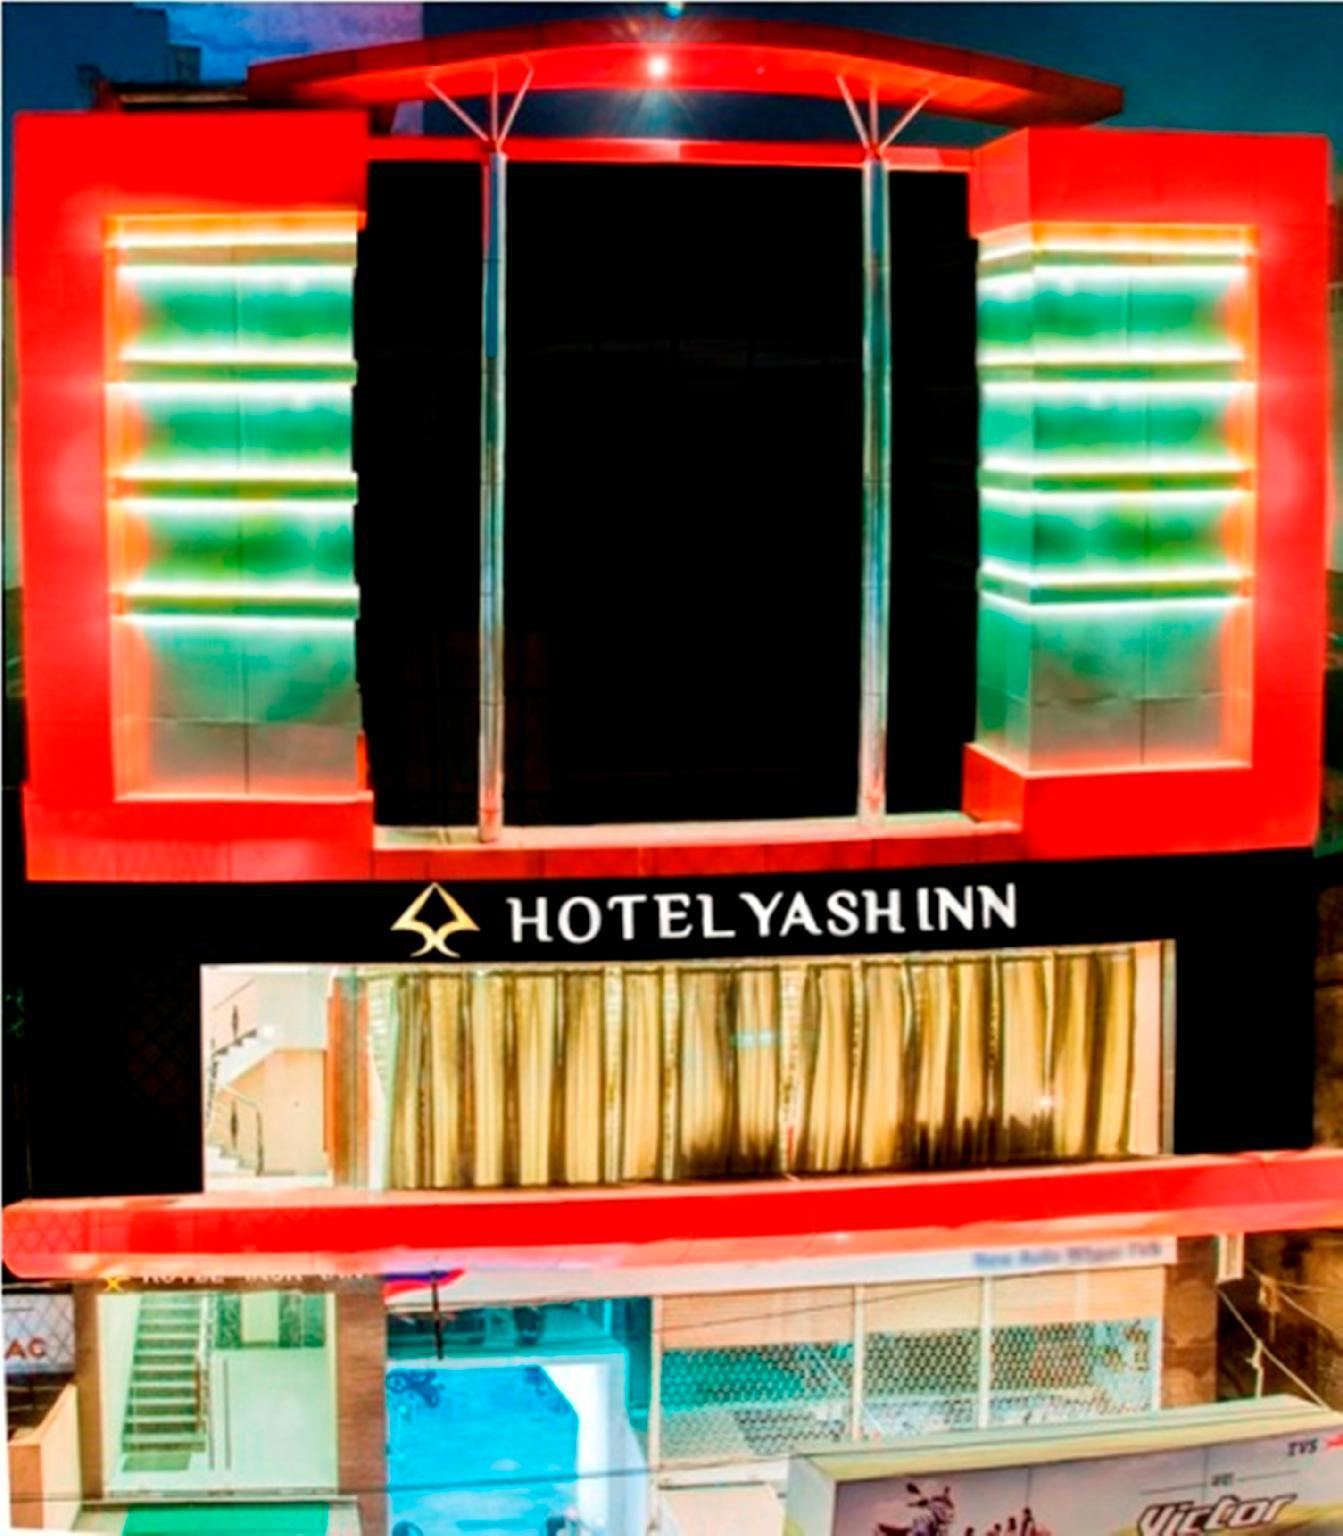 Hotel Yash Inn   Hotels In Mirzapur